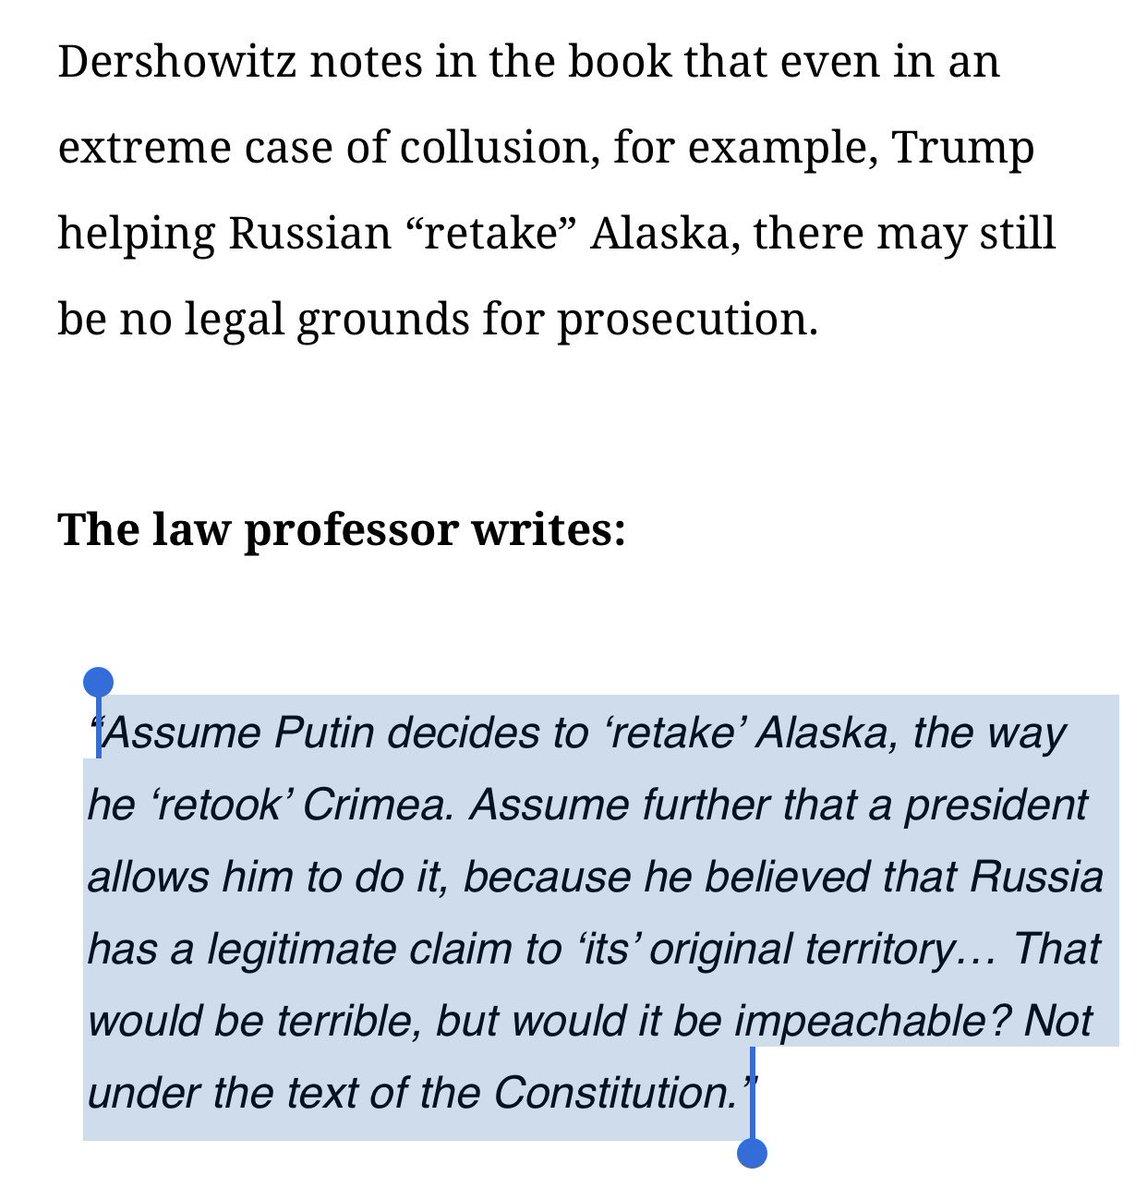 Senator Murkowski, you up?